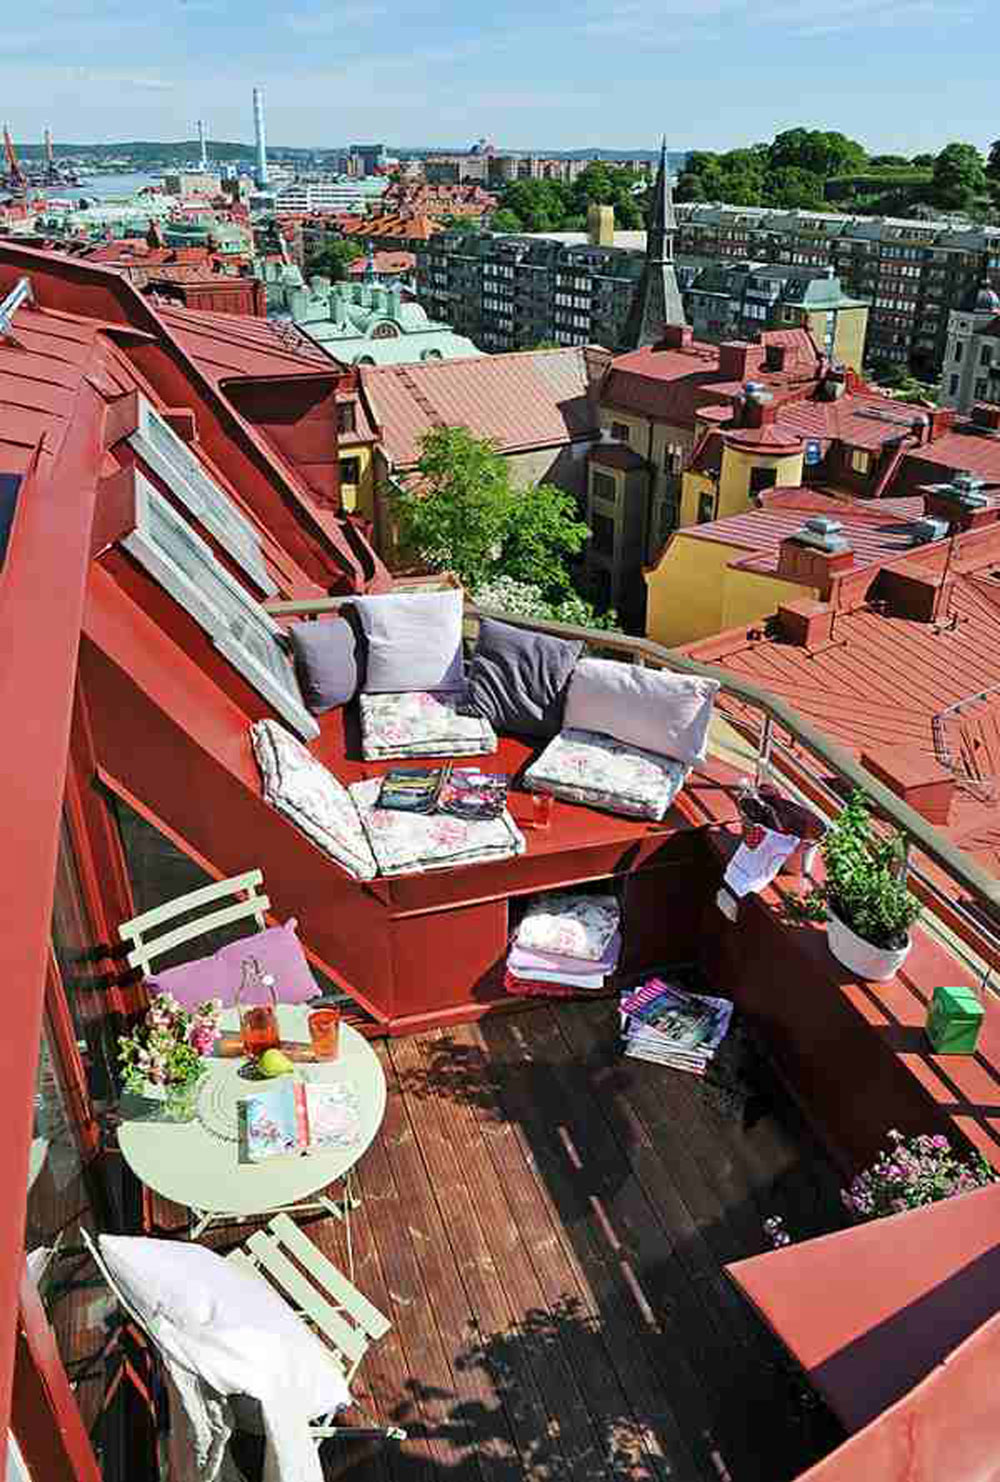 Hus-balkong-design-idéer-för-det-bästa-balkong-design-2 hus-balkong-design-idéer för den bästa-balkong-design